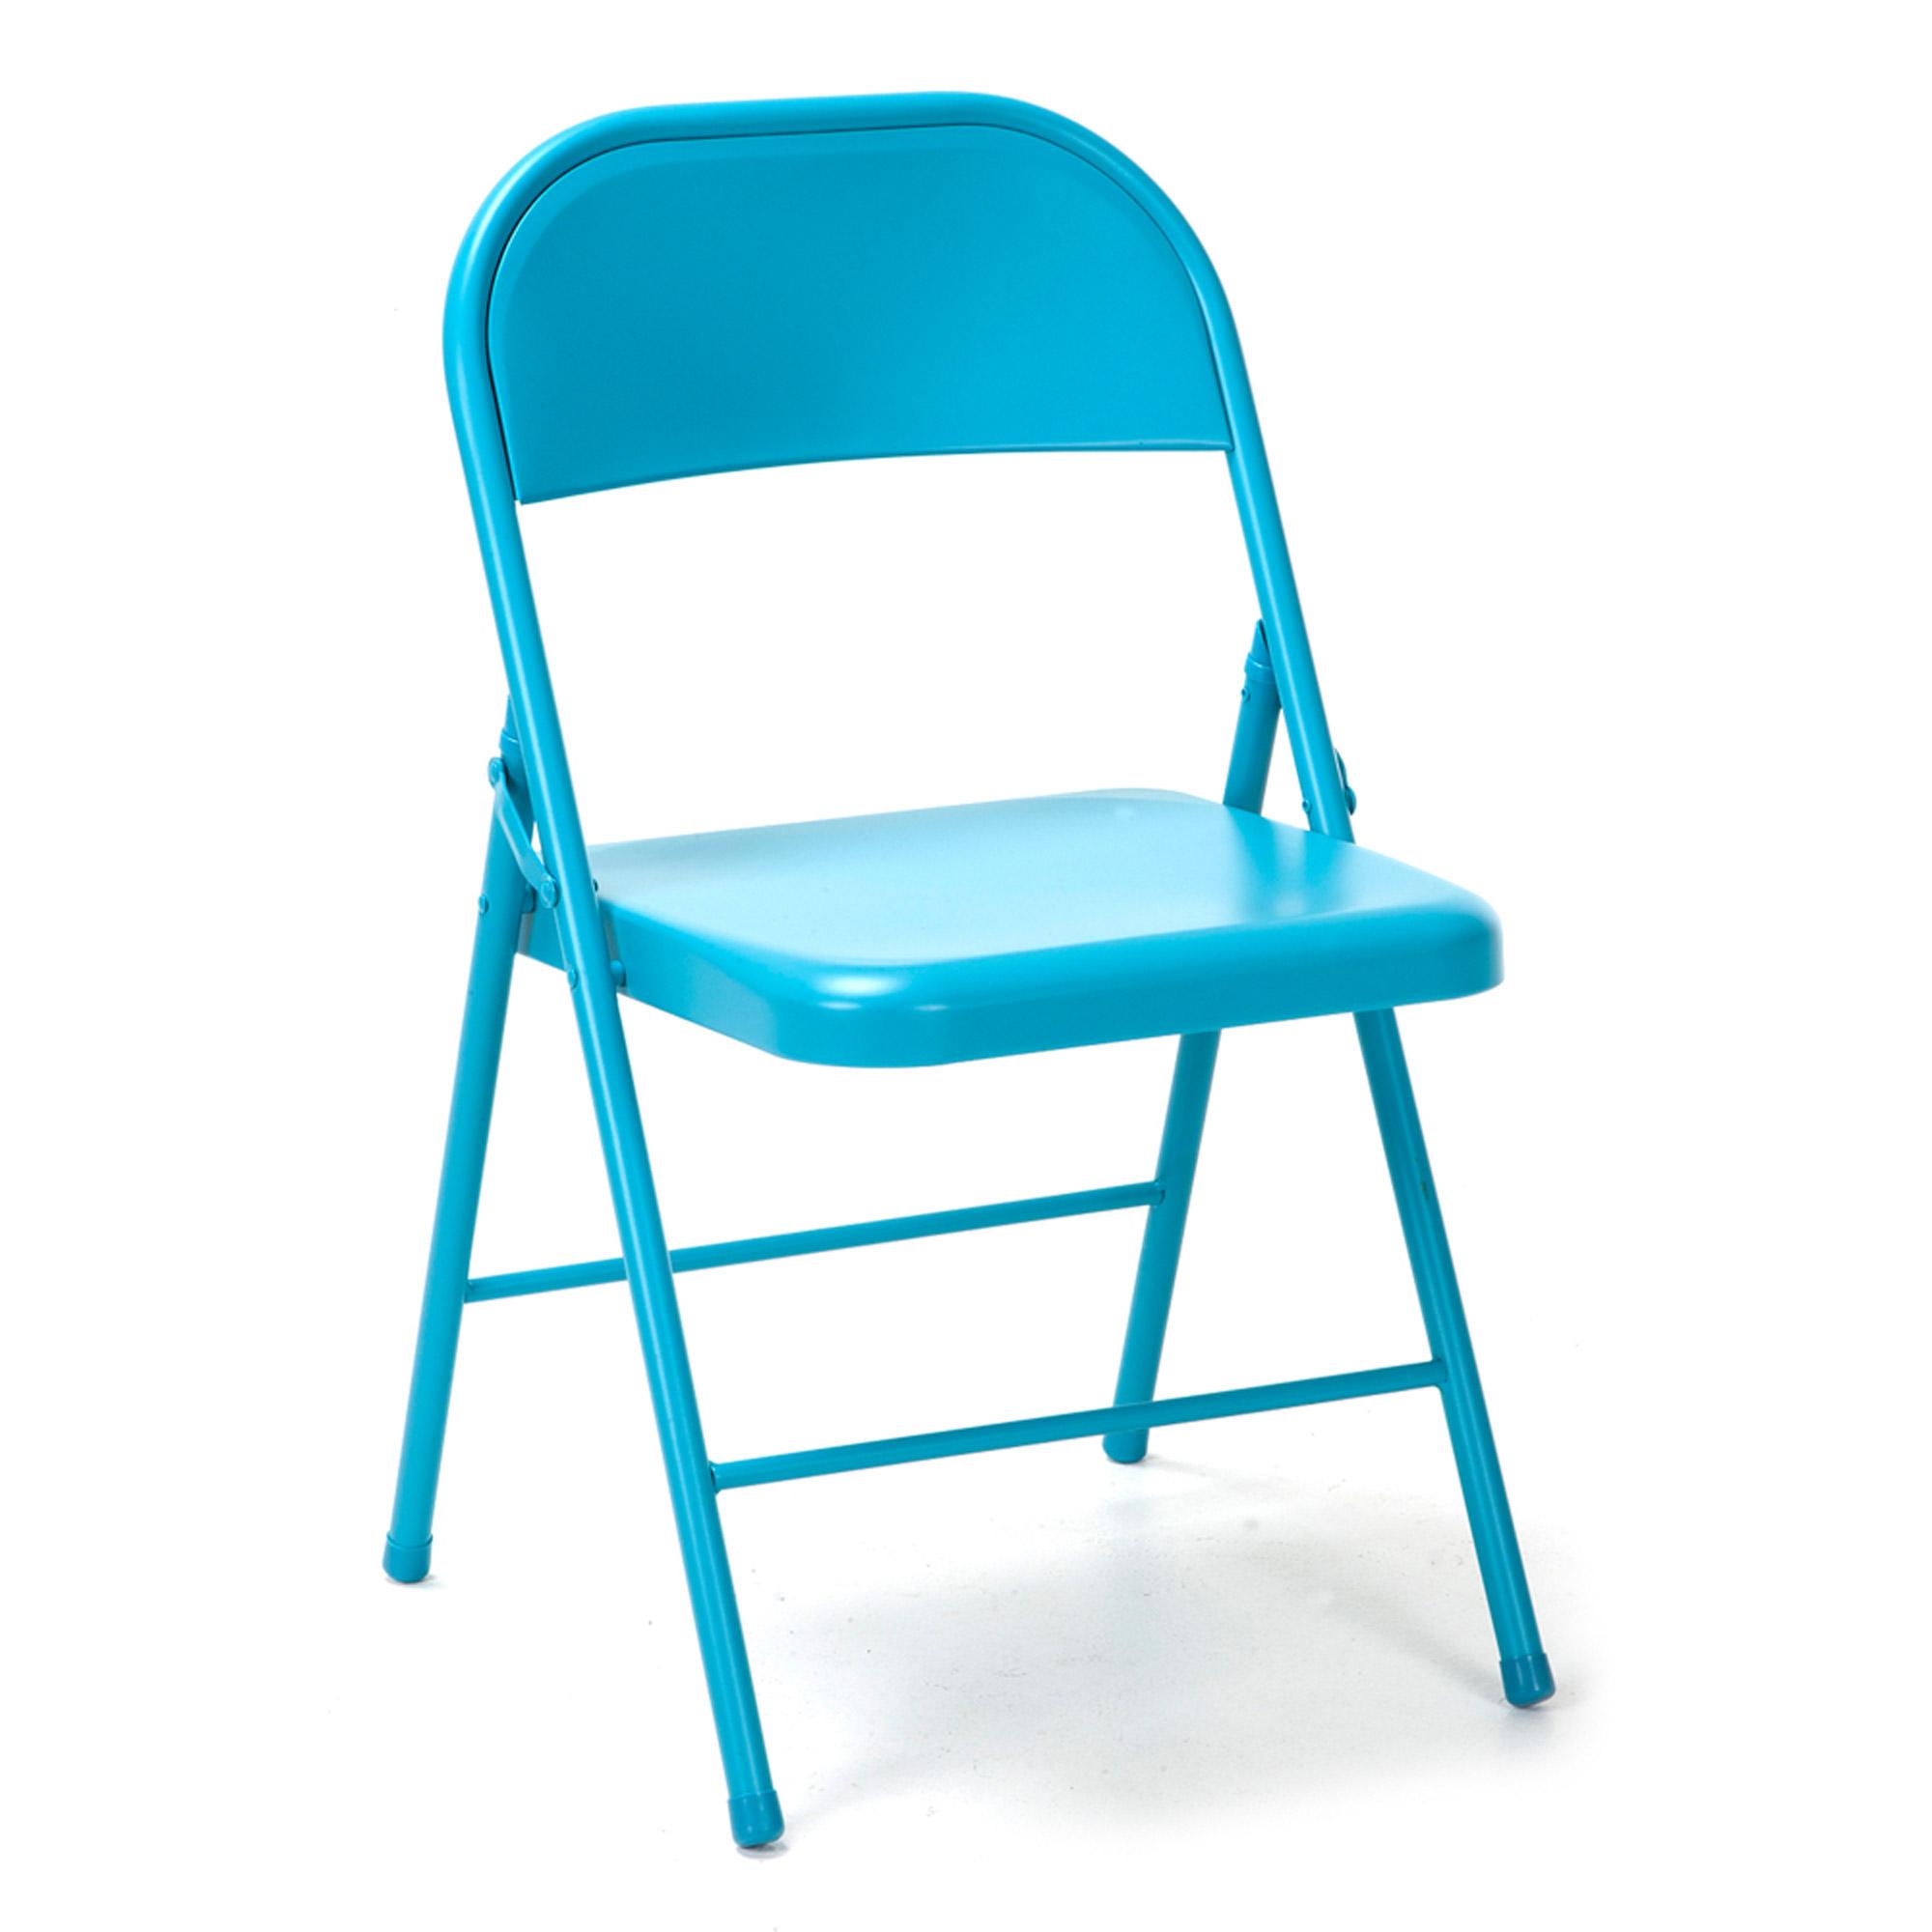 Novogratz All Steel Folding Chair, 2 pack, Multiple Colors - Walmart.com